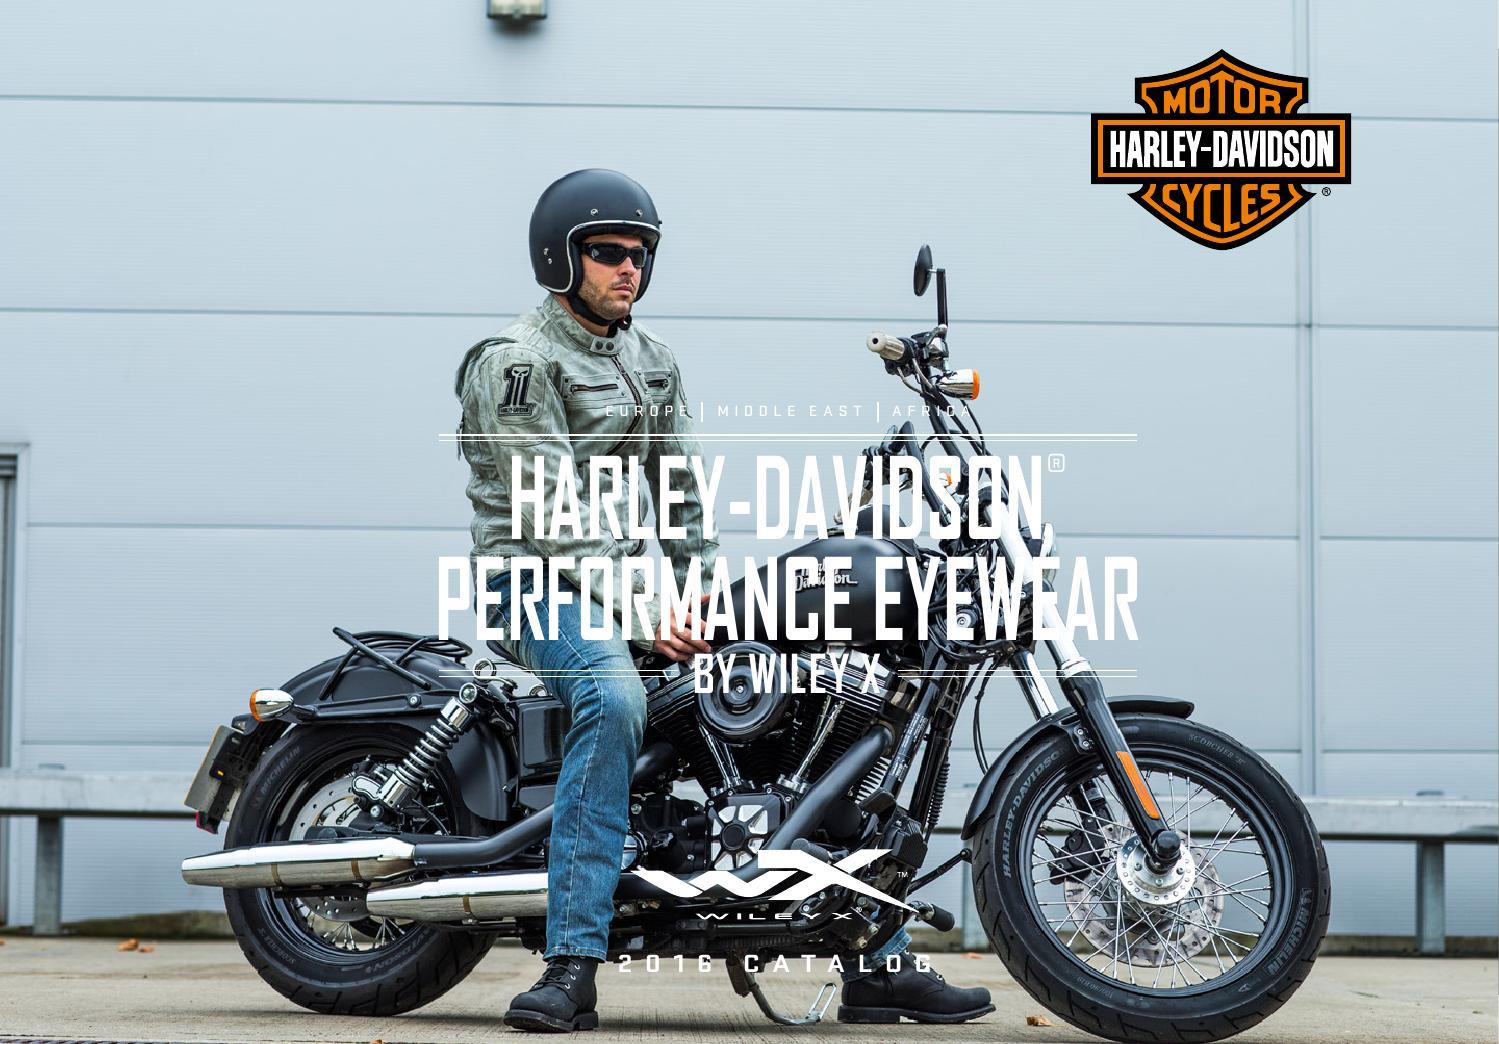 8157fea6e6 Harley-Davidson Performance Eyewear by Wiley X 2016 English Catalog ...